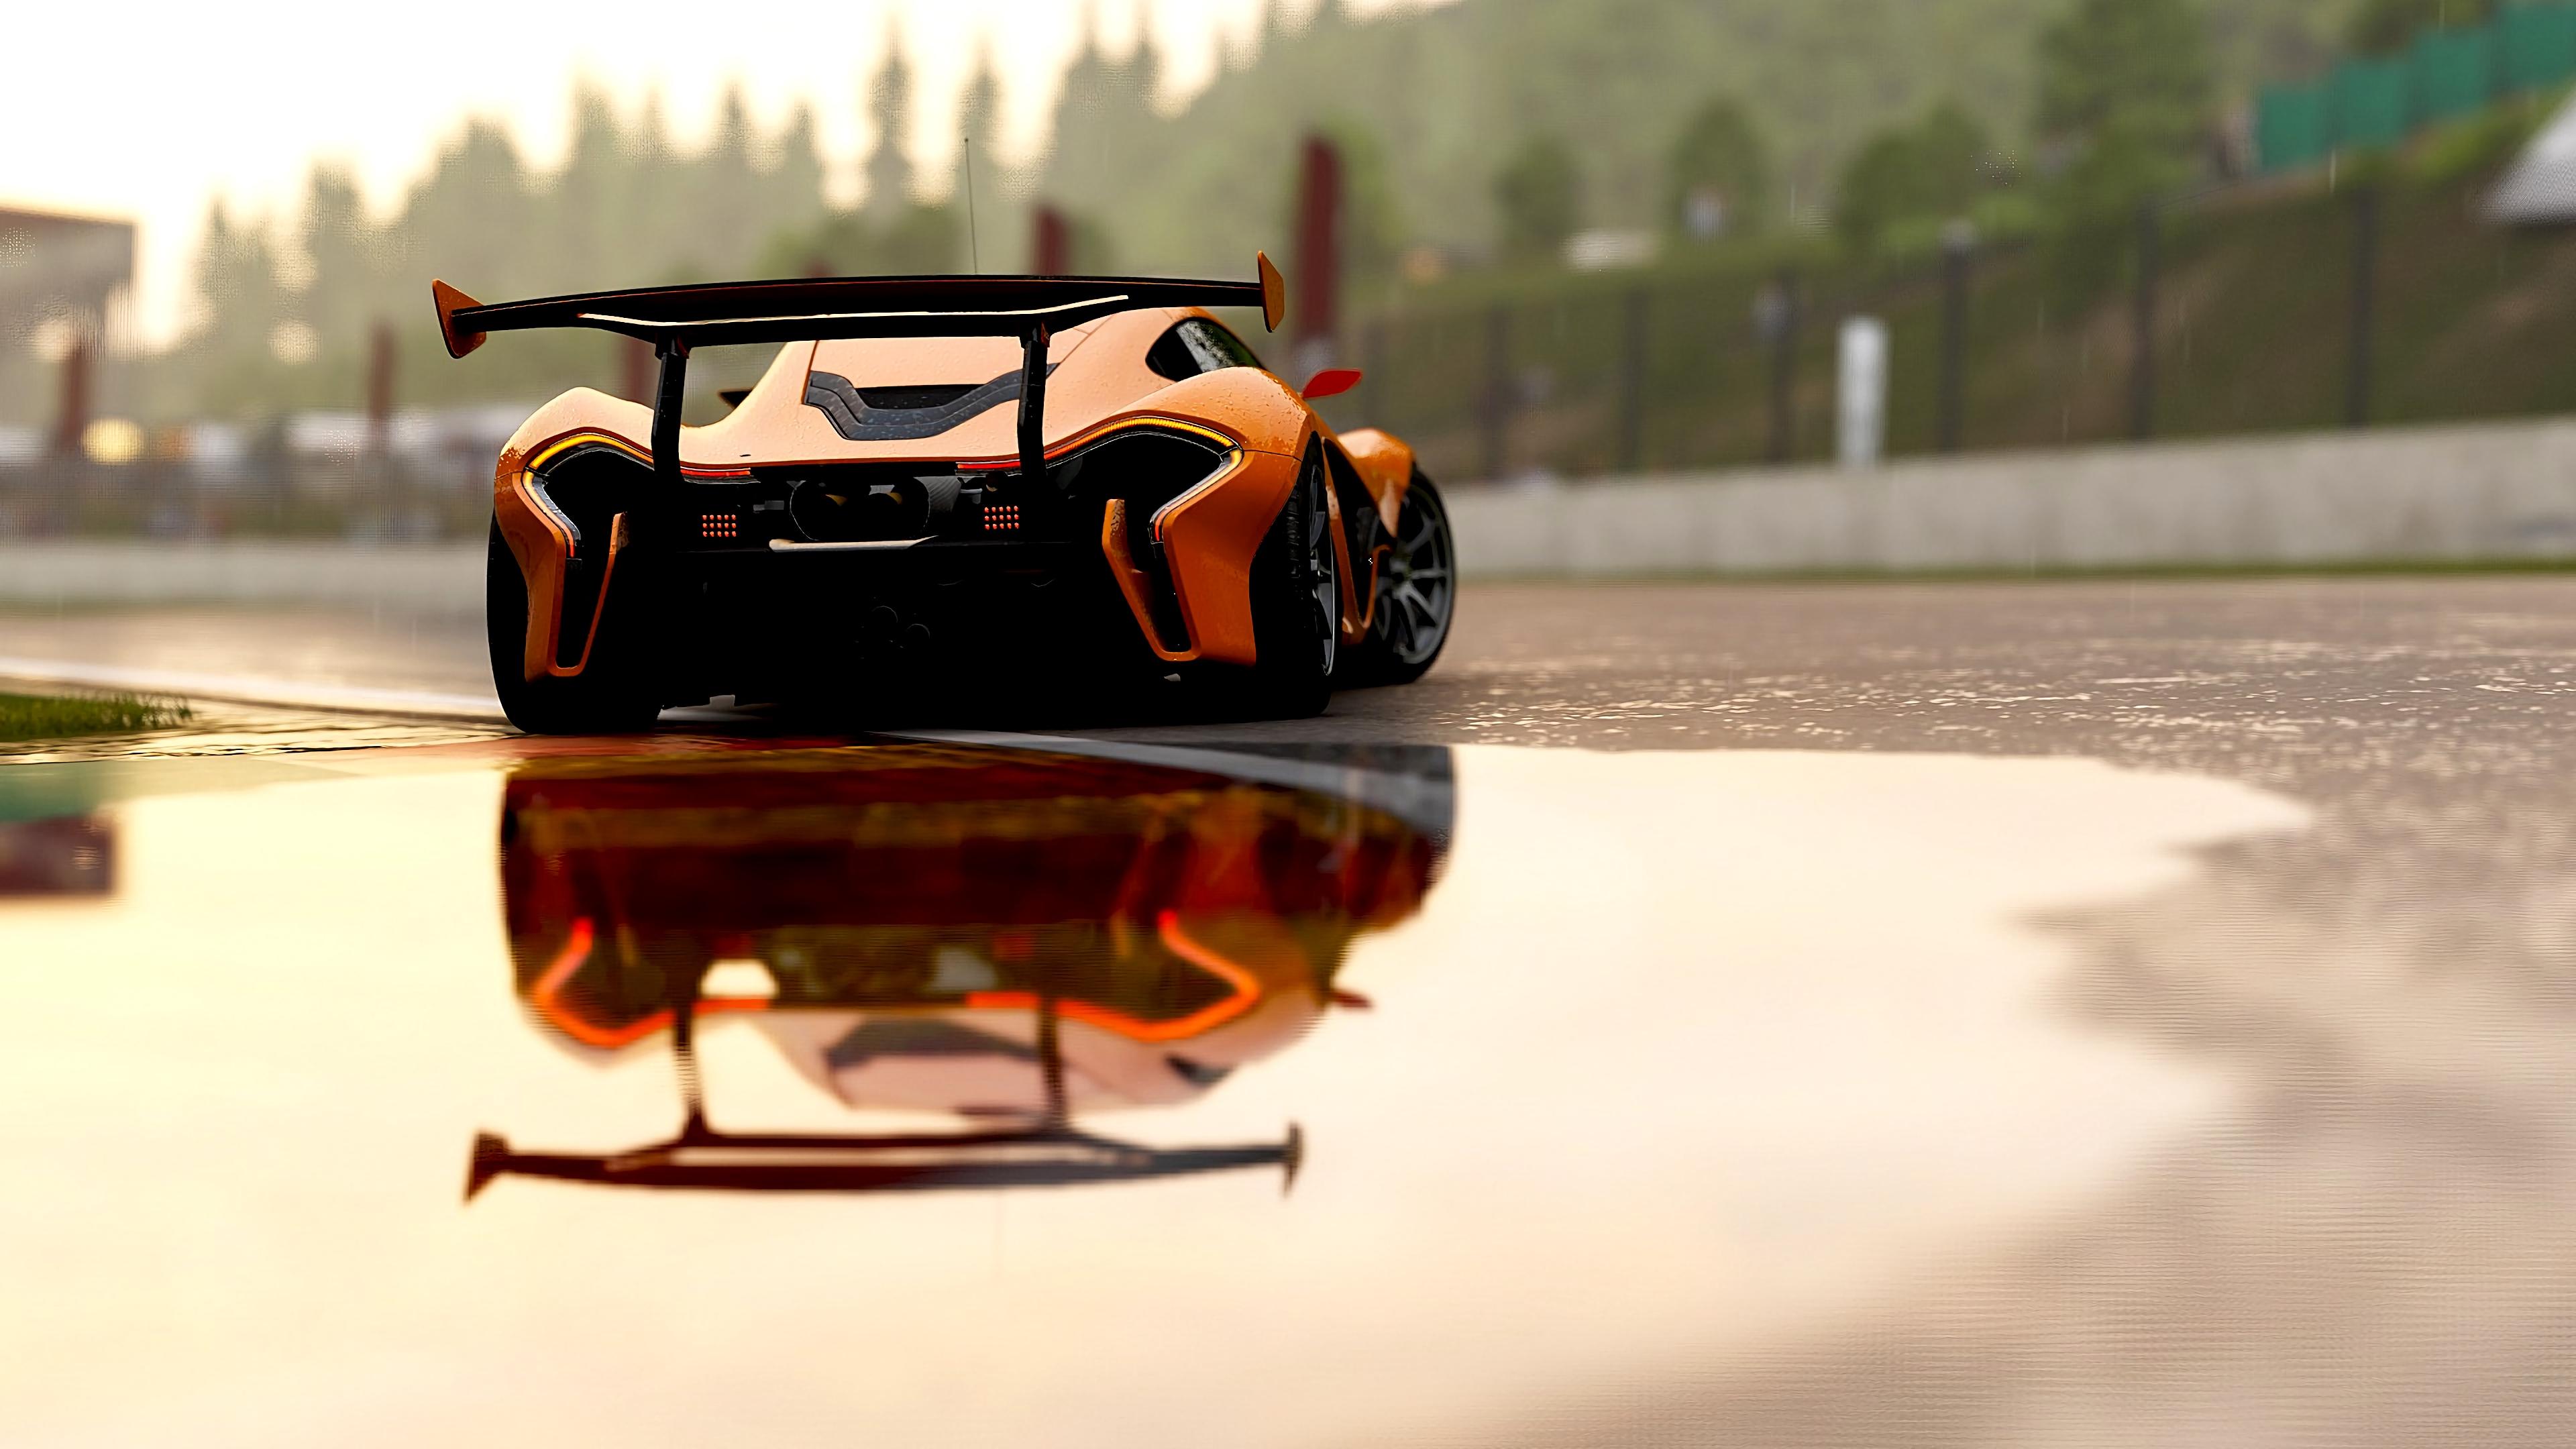 McLaren P1 4k Ultra HD Wallpaper   Background Image ...